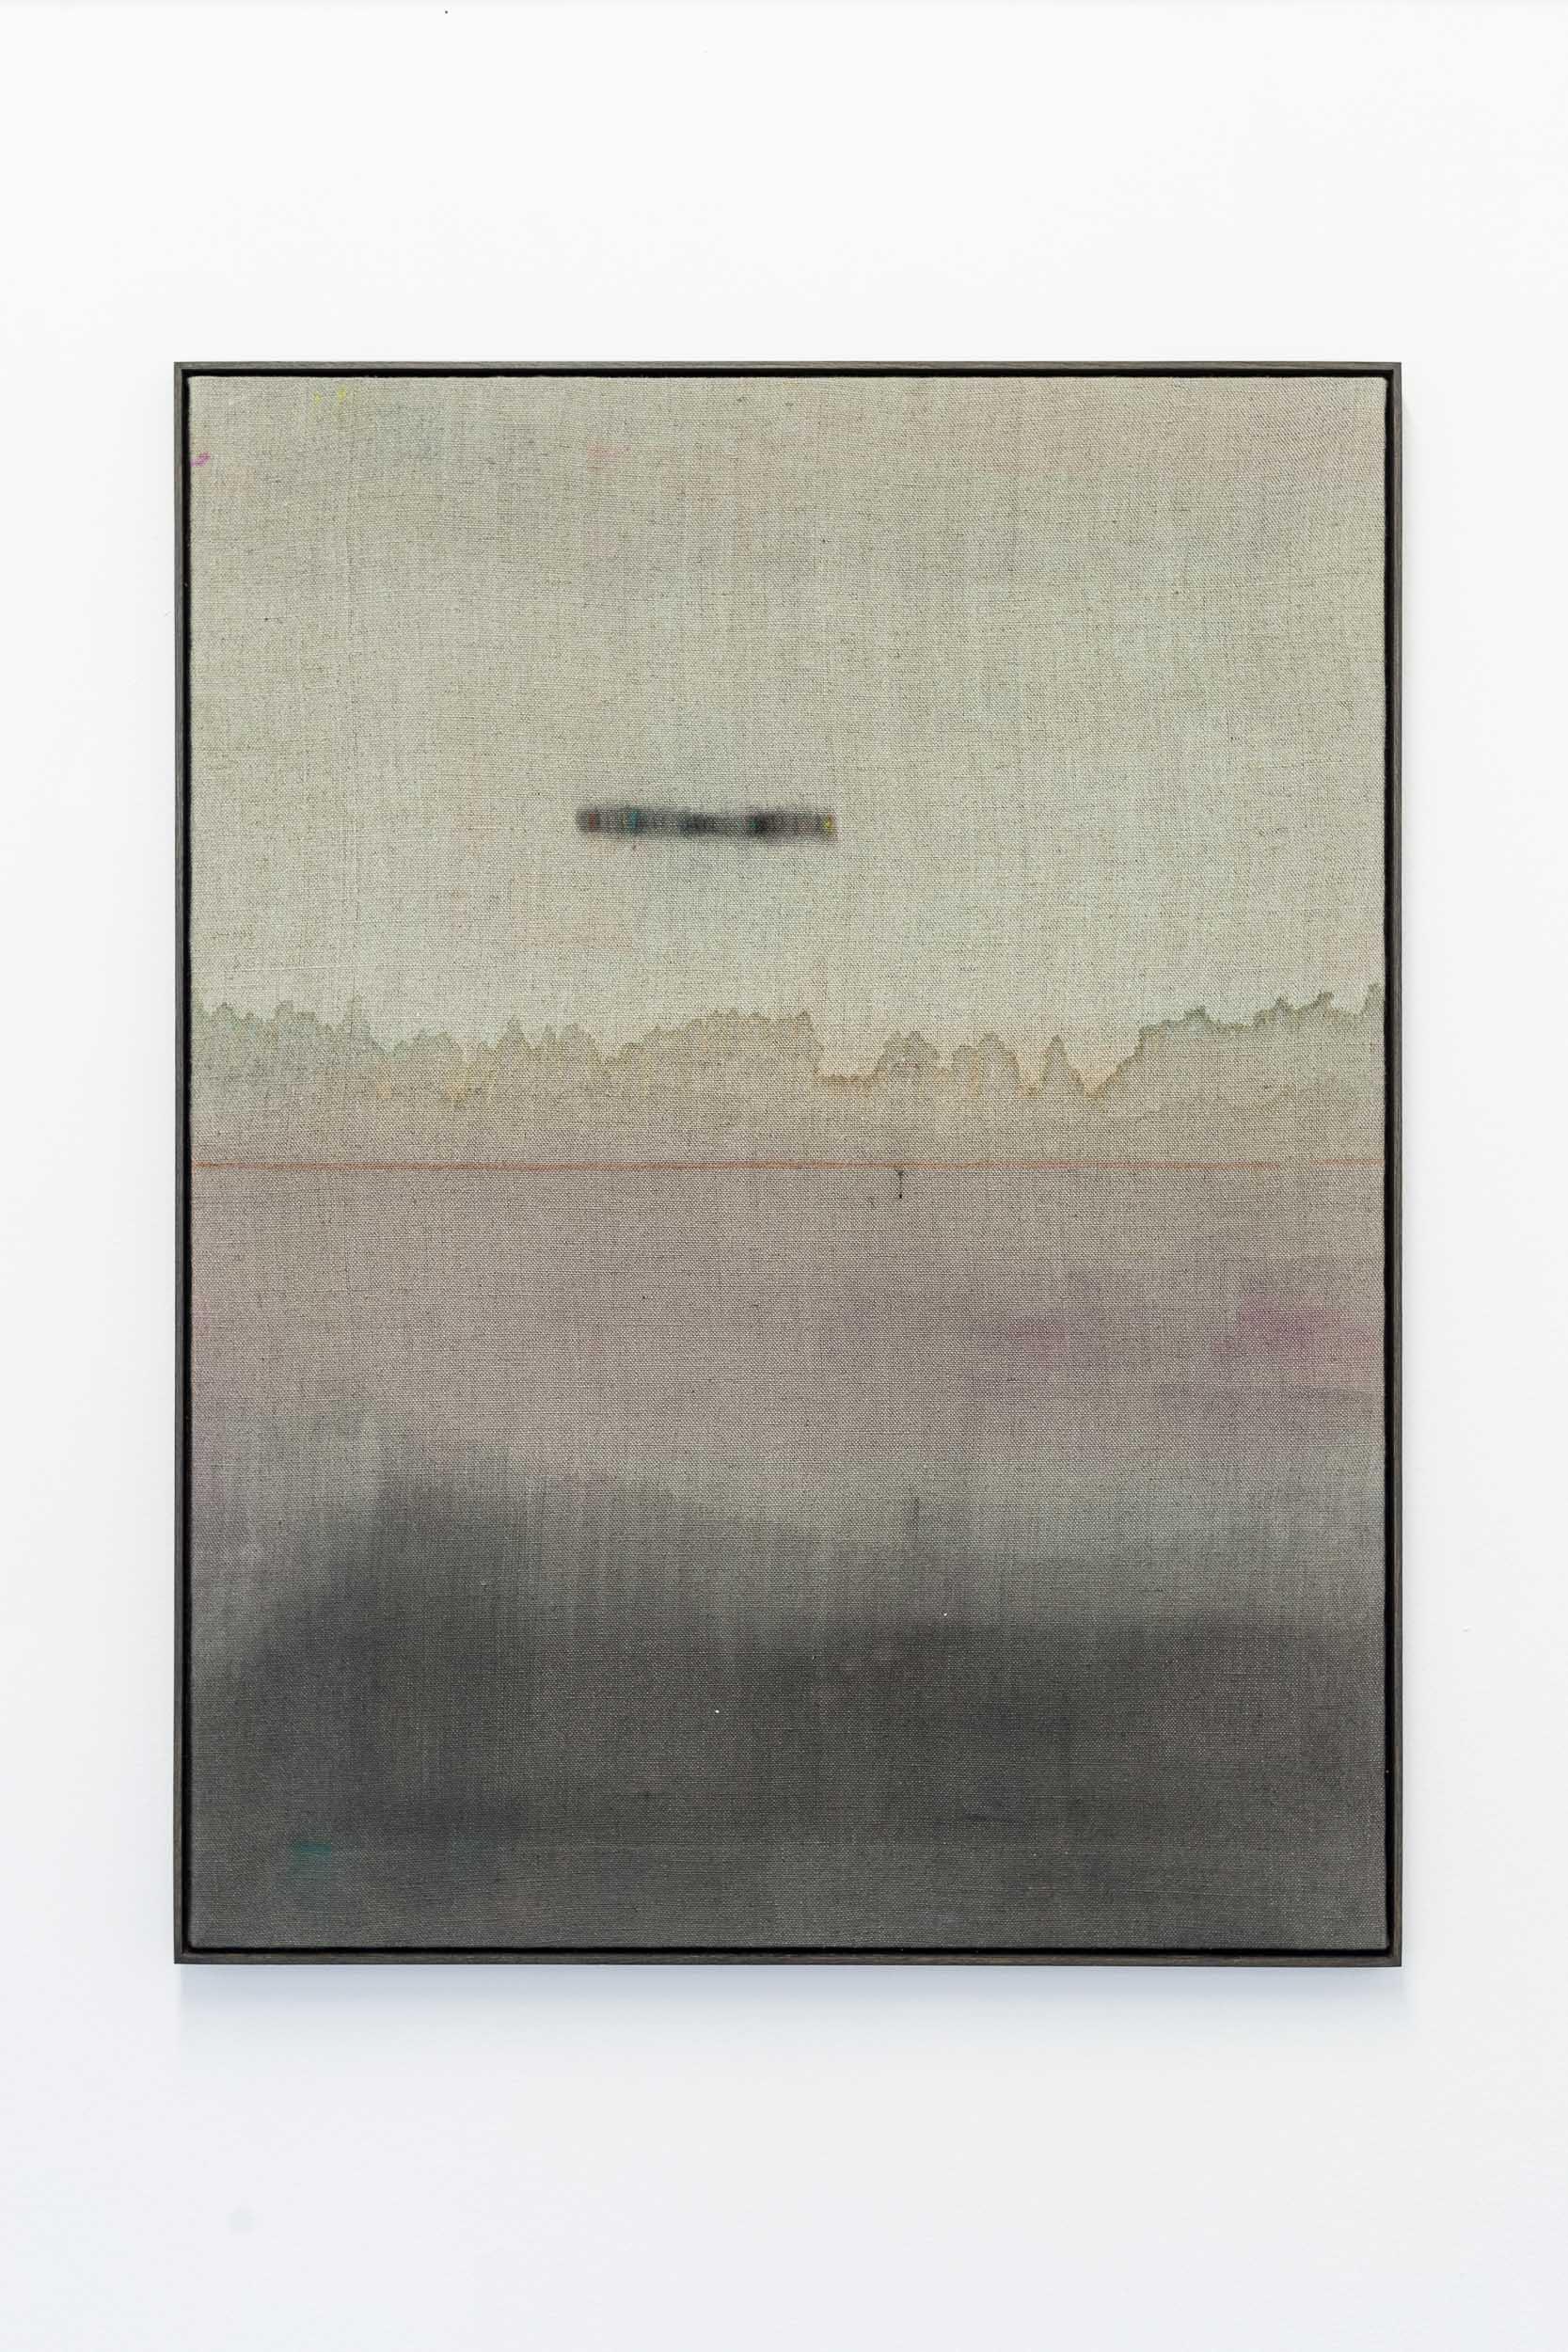 Kirstine Roepstorff,  Illustration # , 2017,   Watering:Pigment, cloth, linen  ,   72 x 94 cm Photo: Kilian Bannwart